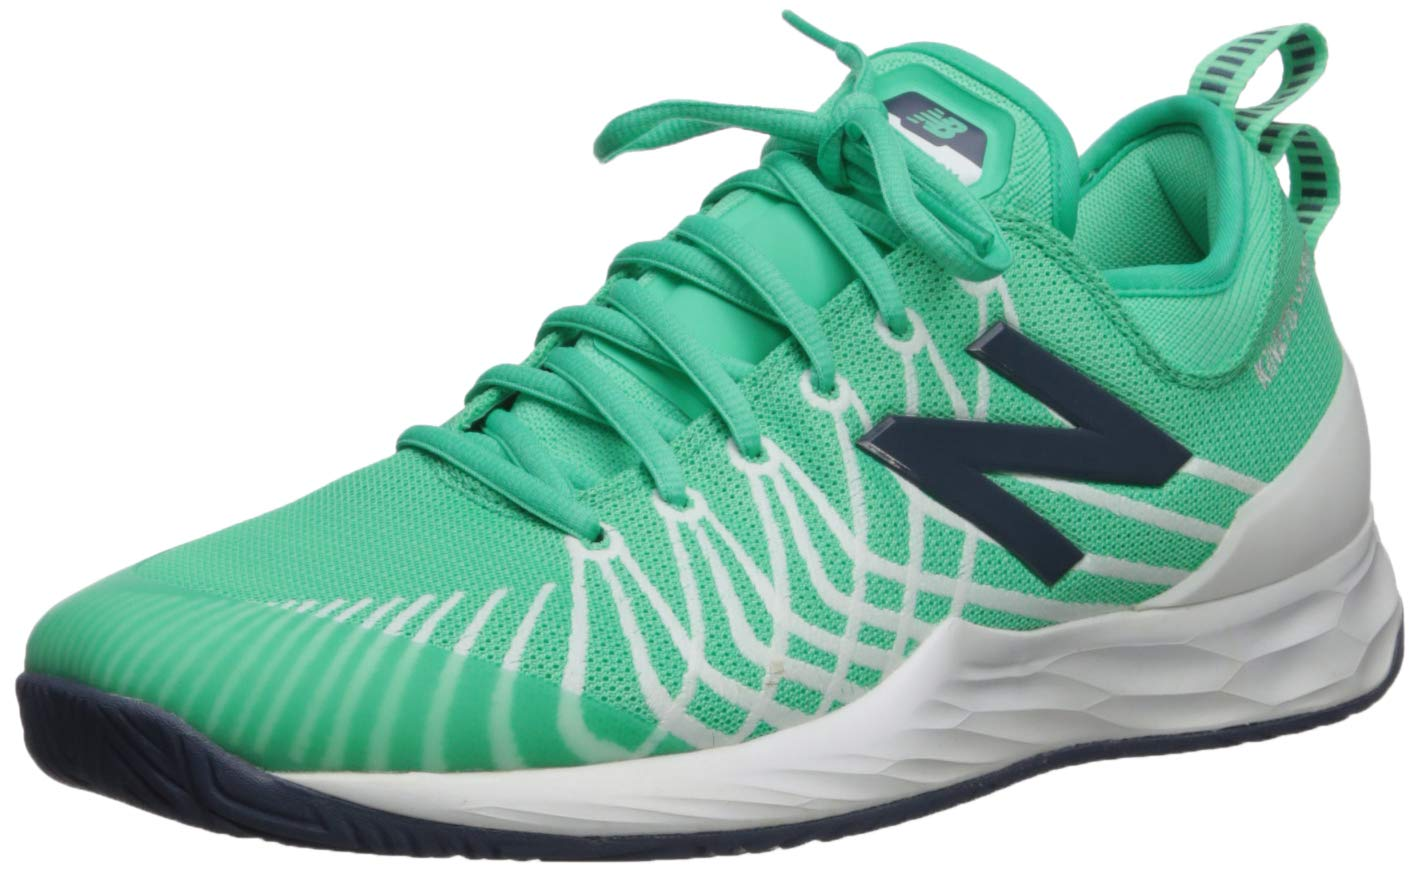 New Balance Men's LAV V1 Hard Court Tennis Shoe, Neon Emerald/White, 1.5 D US